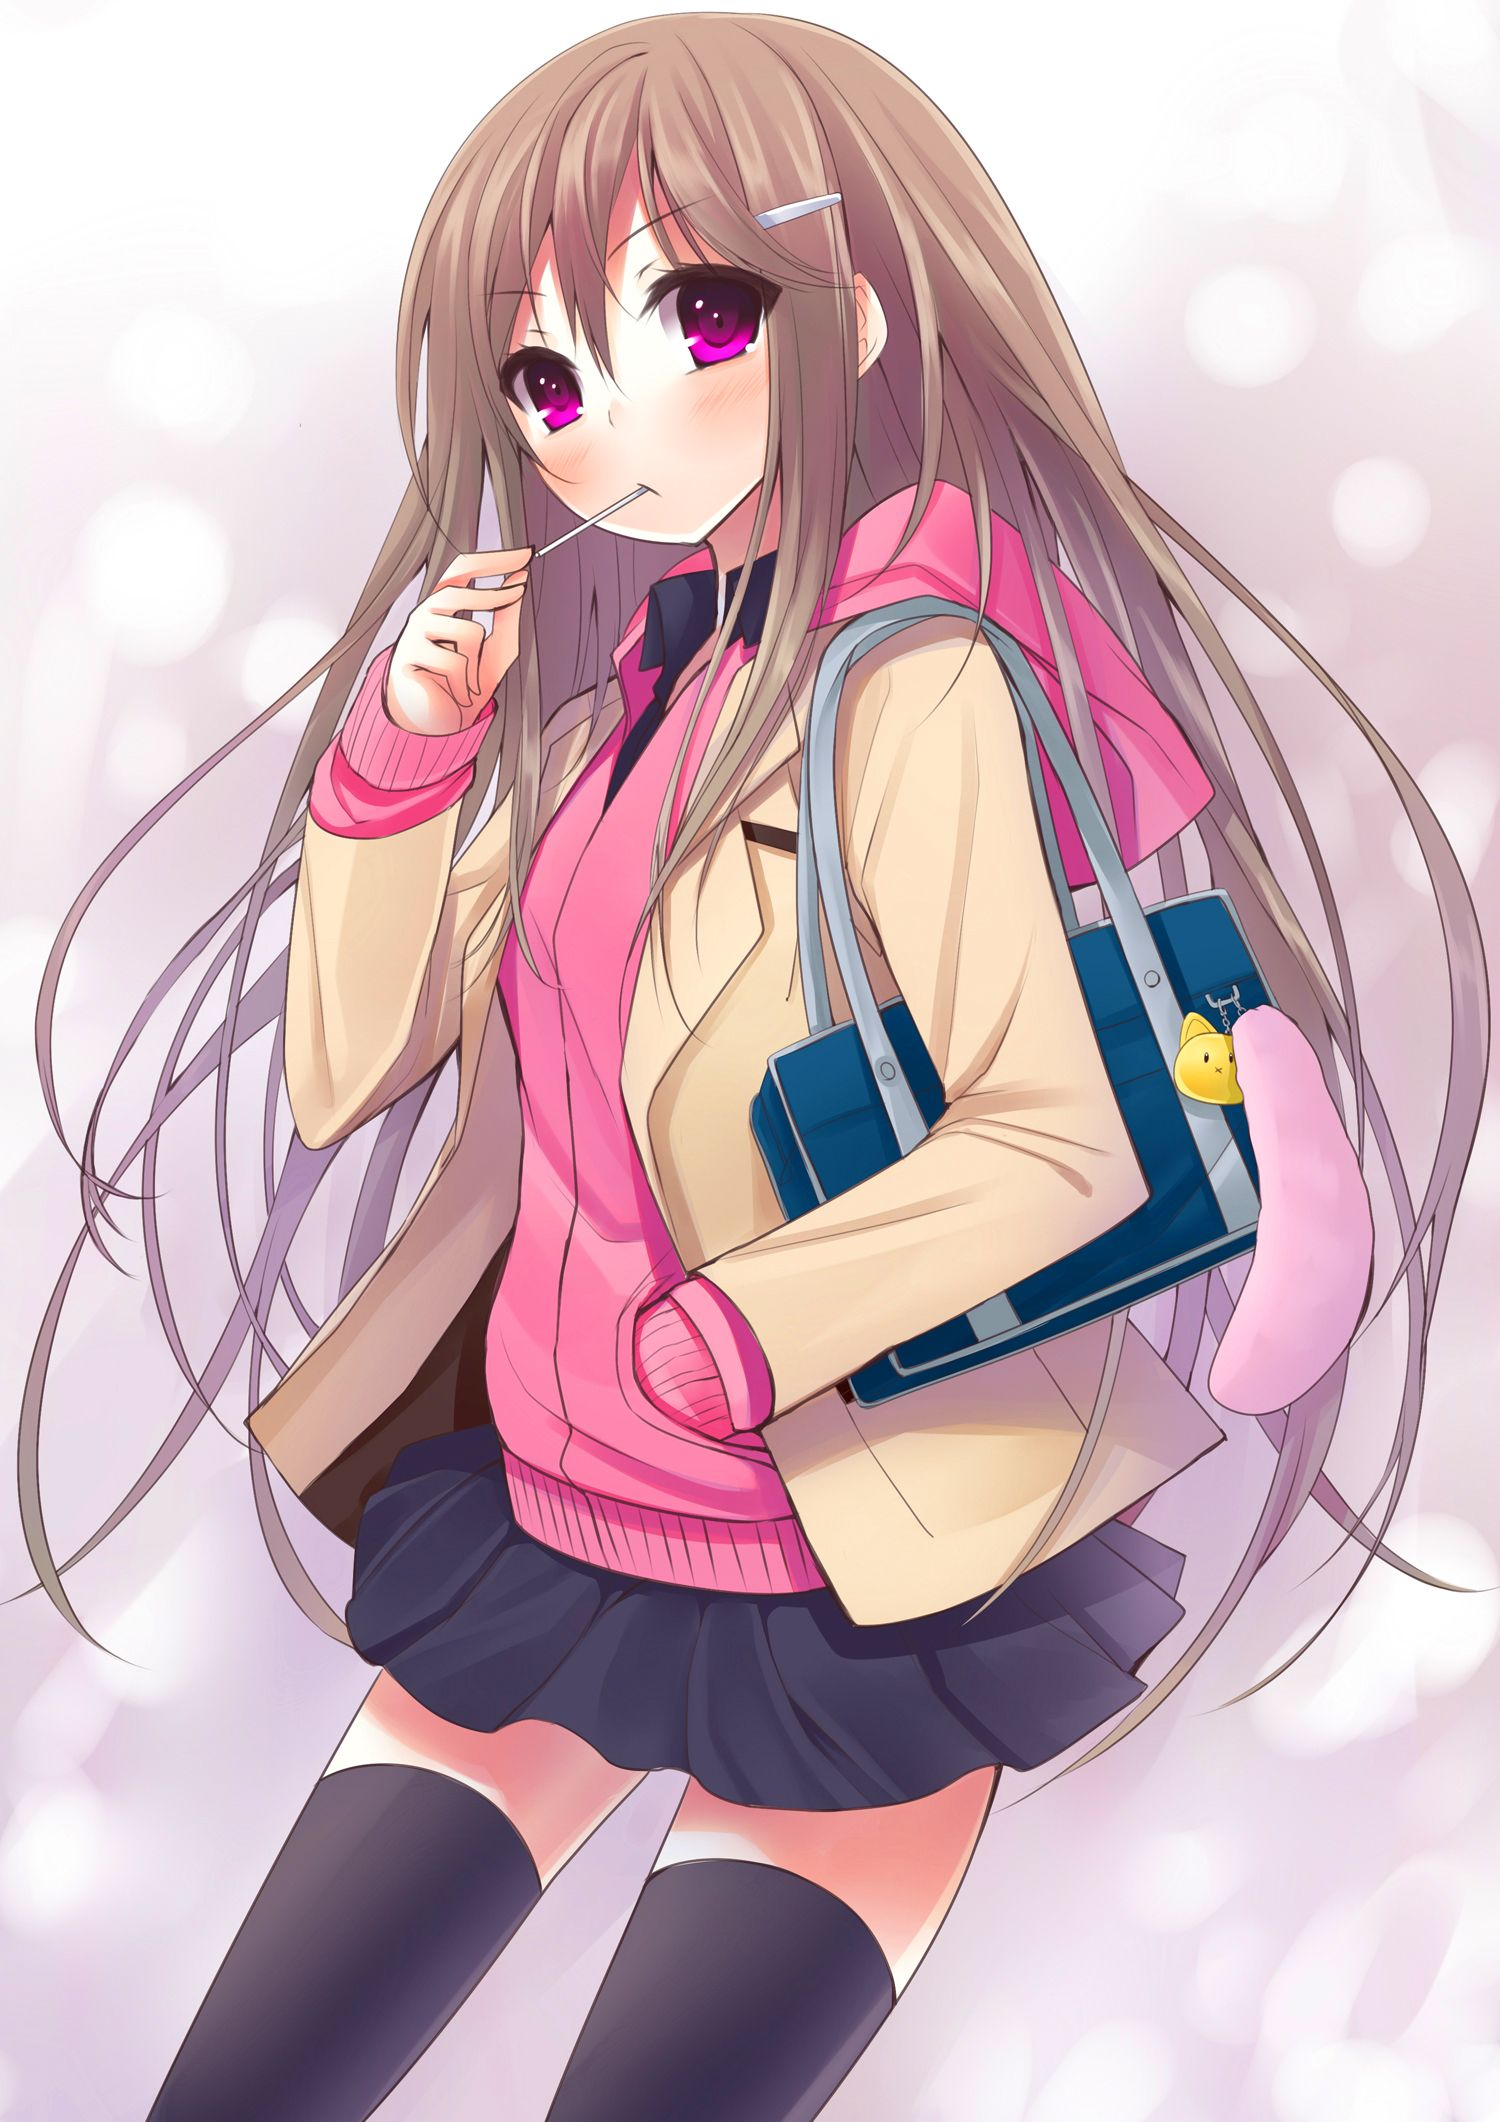 344770-1500x2122-original-tanakahazime+(artist)-long+hair-single-tall+image-blush.jpg (1500×2122)